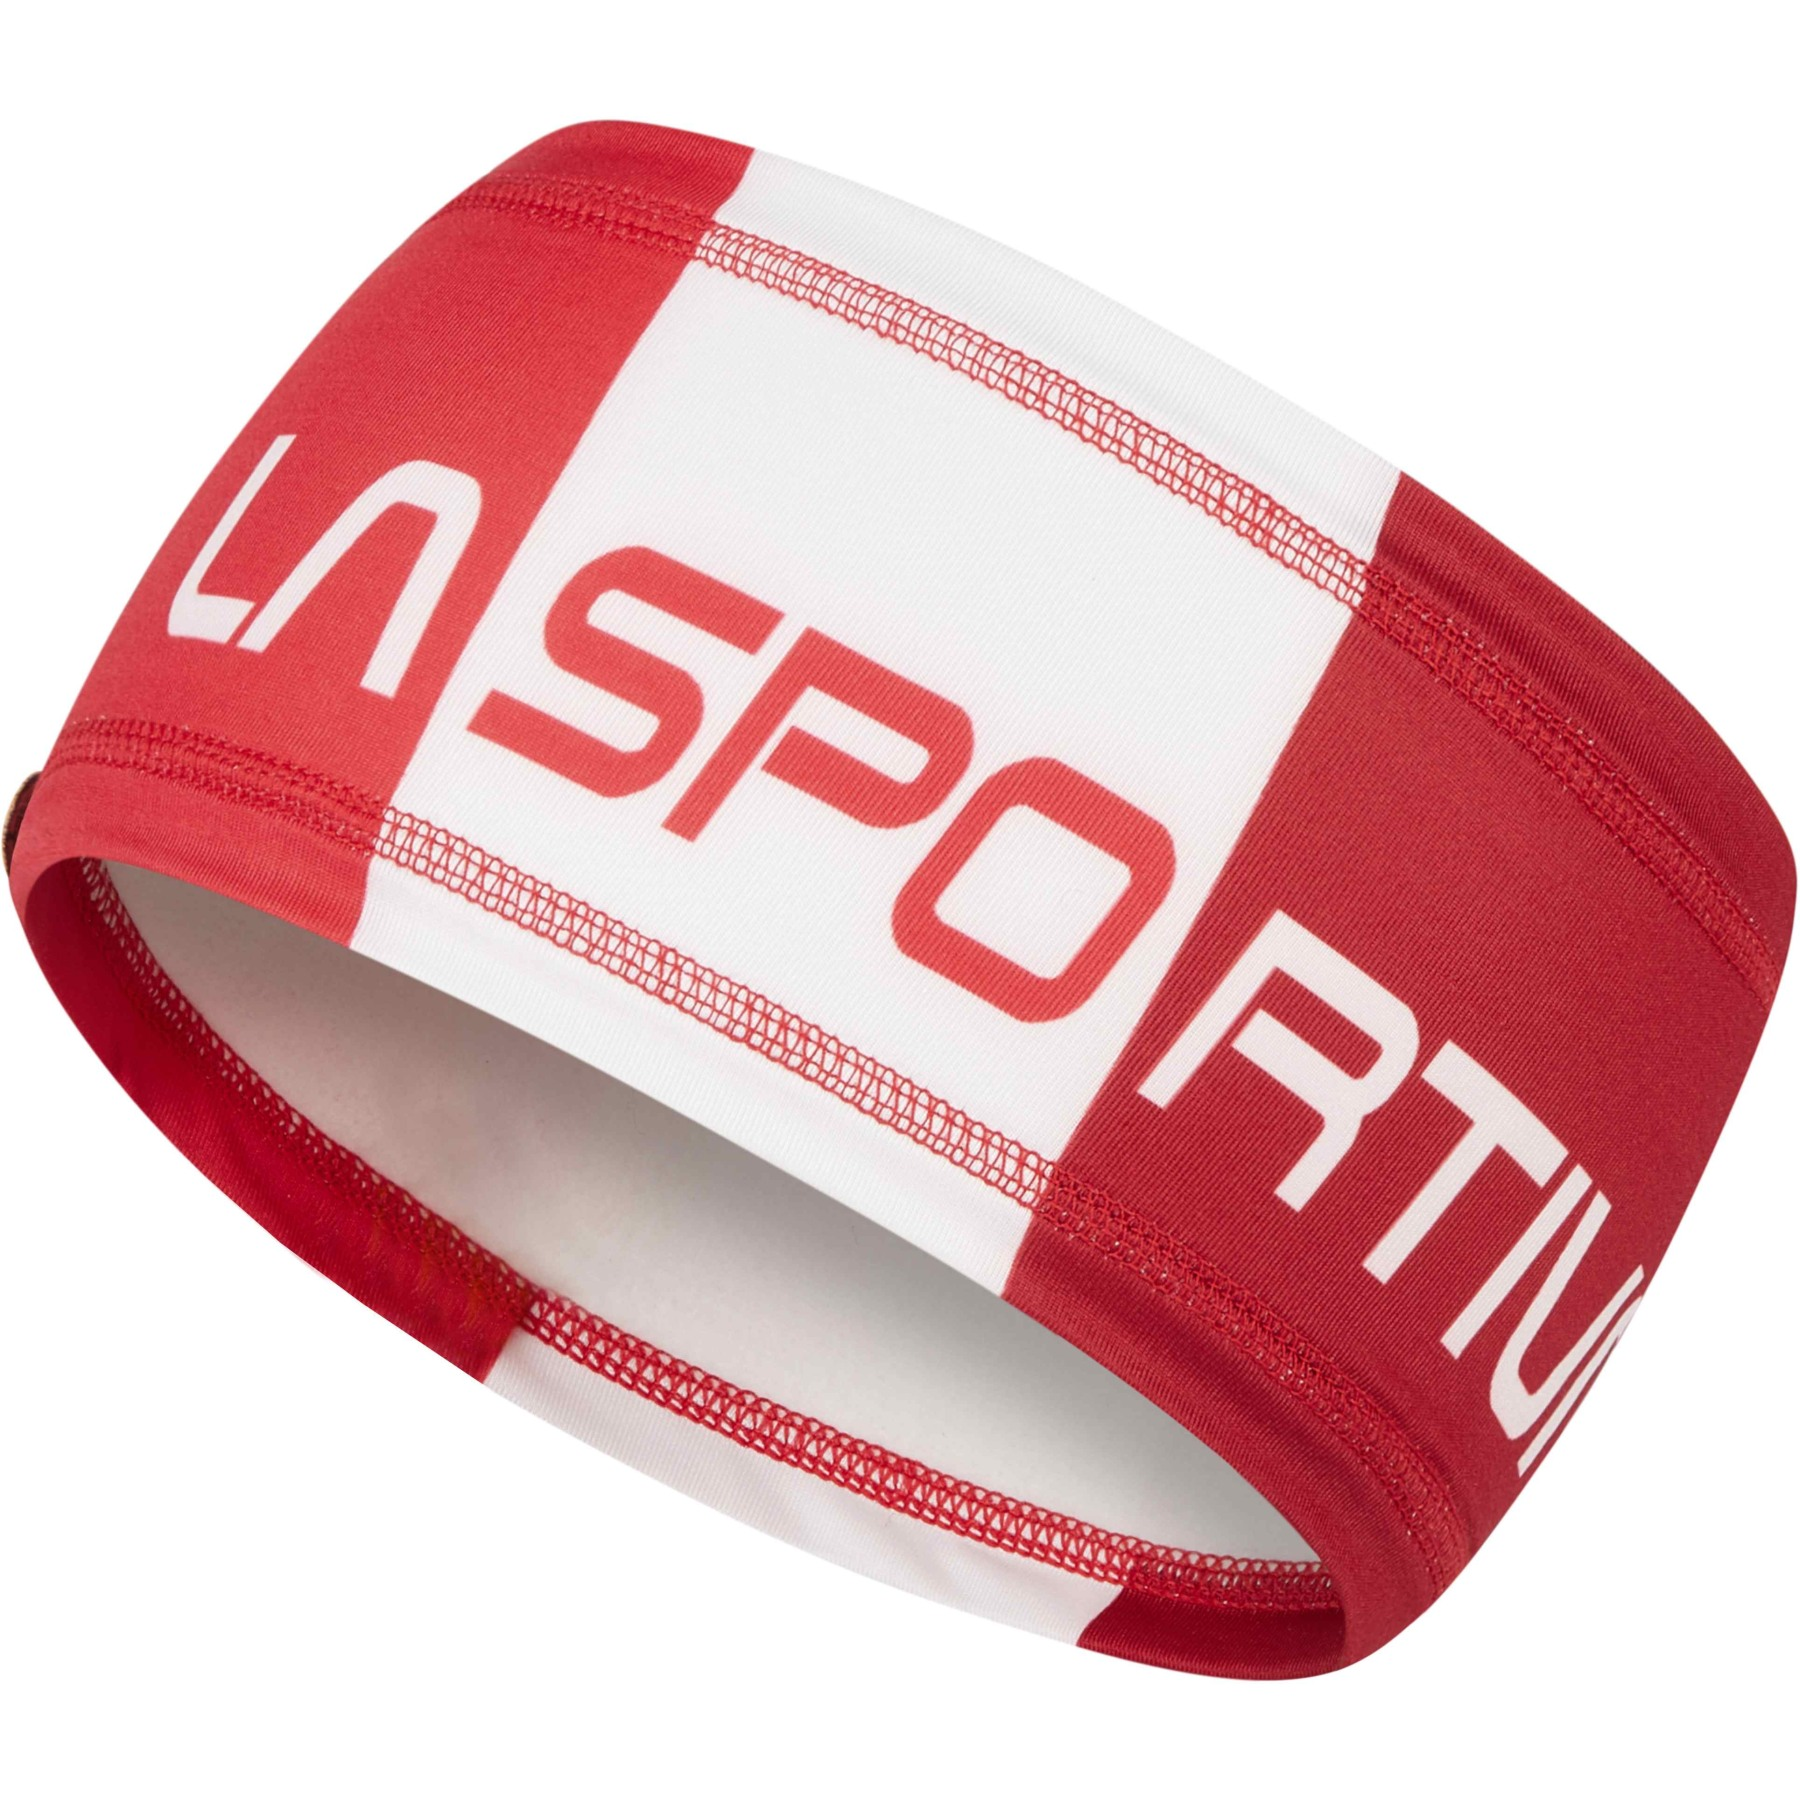 La Sportiva Headband weiß hibiscus